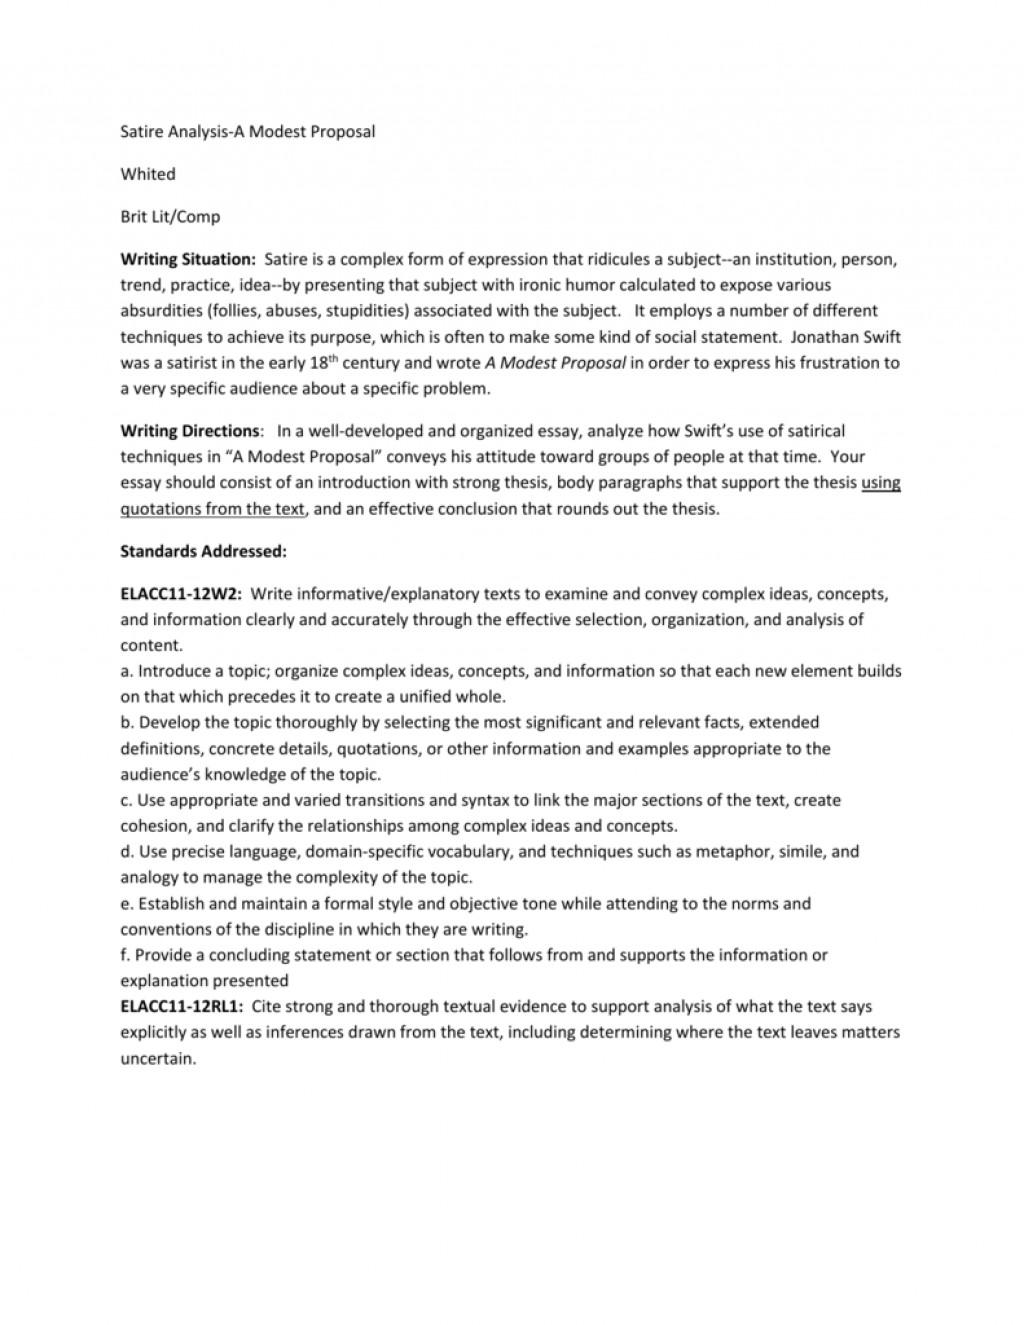 Astounding A Modest Proposal Essay Thatsnotus